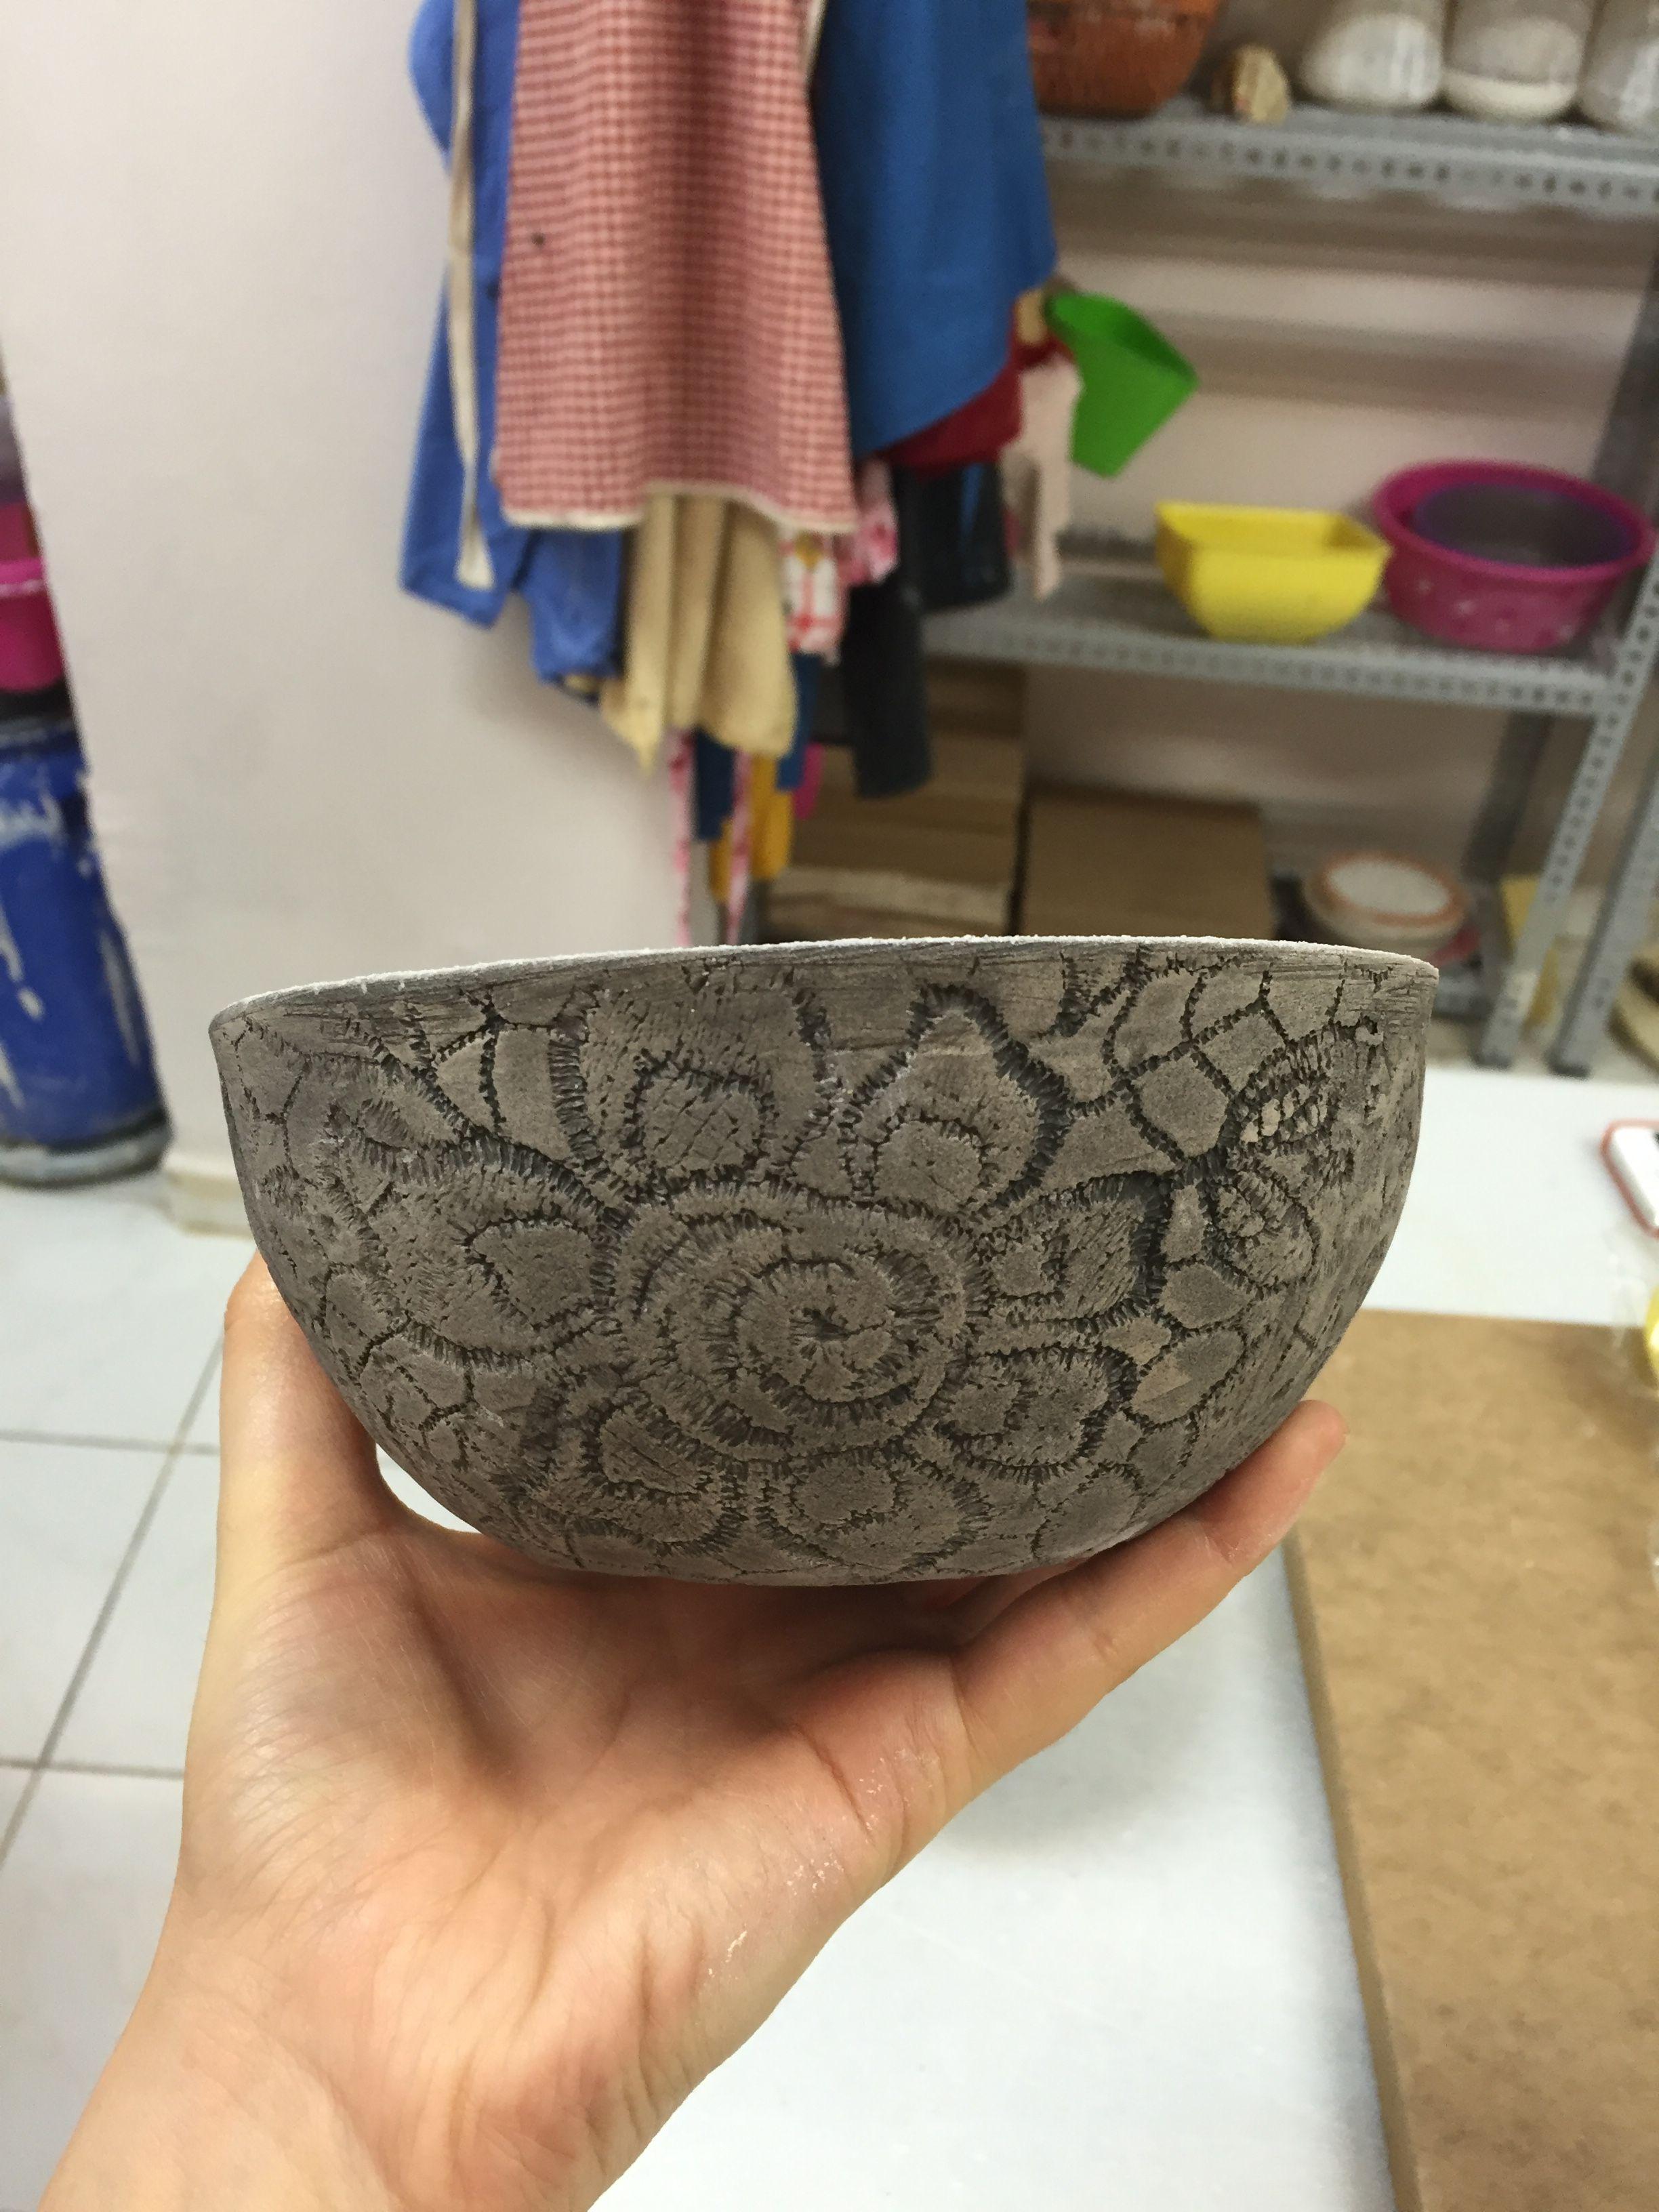 #Handmade#By#Me#Antique#Unique#Ceramic#Bowl#Cup